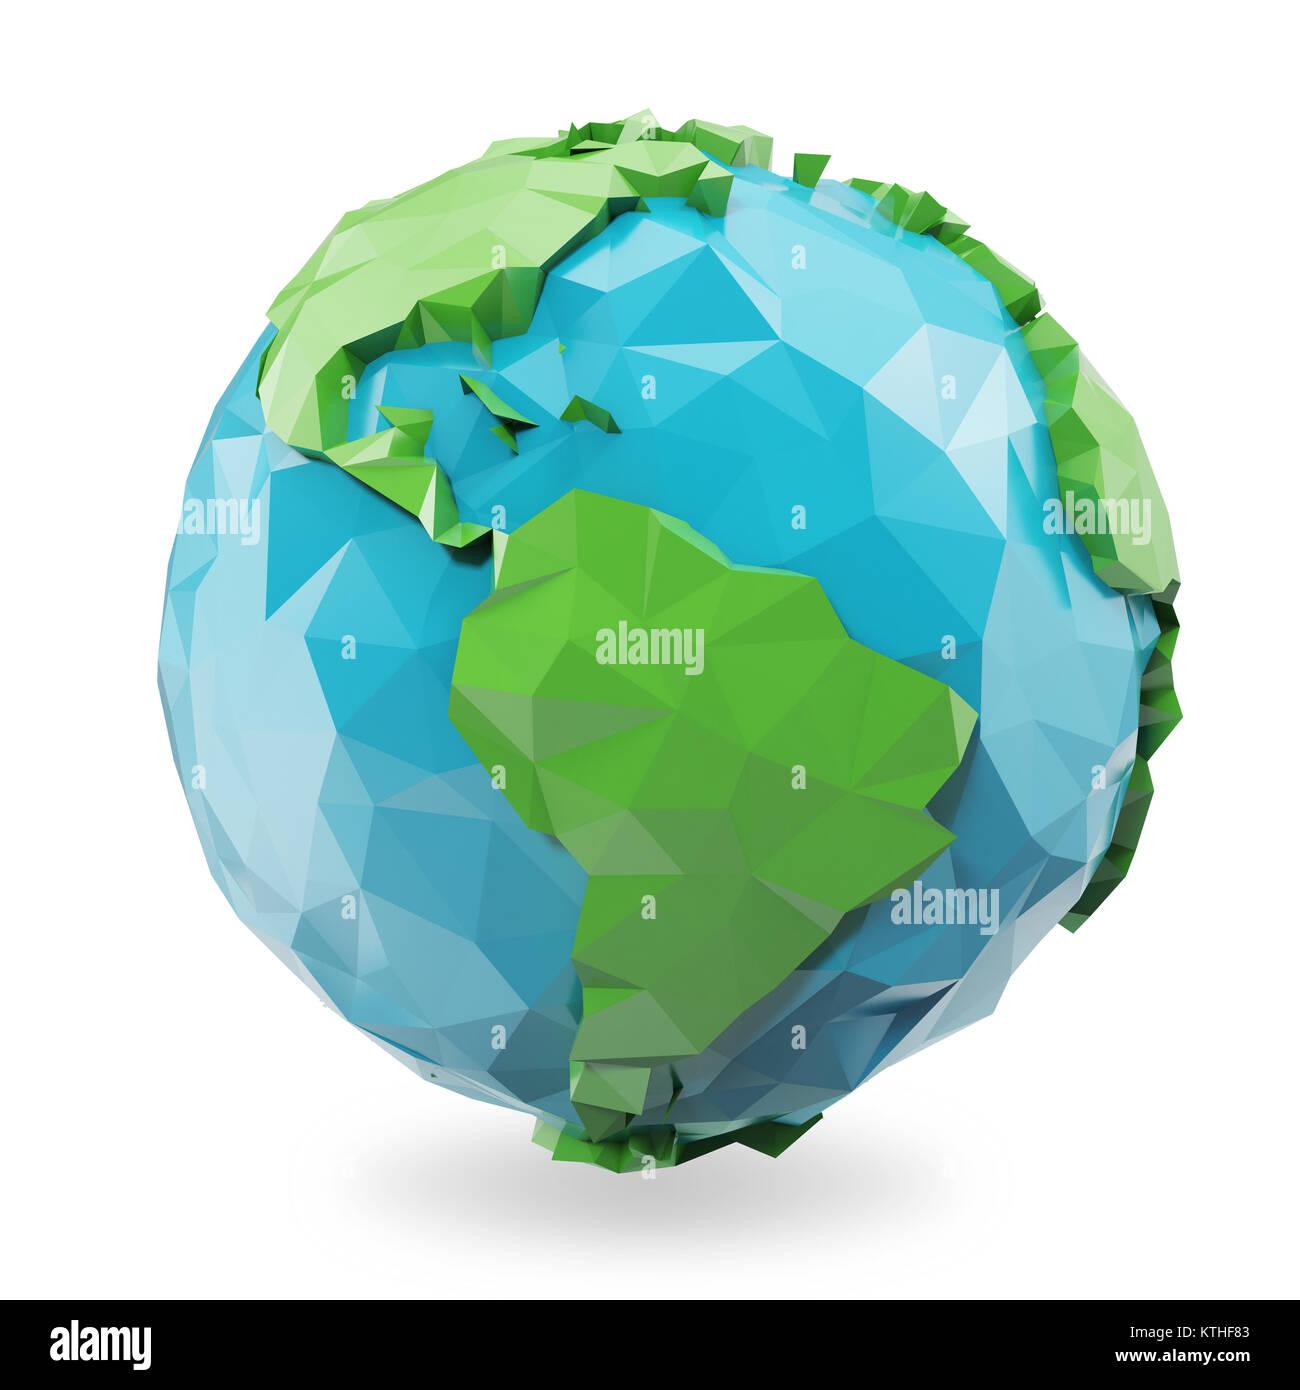 polygon design 3d globe stock photos polygon design 3d globe stock